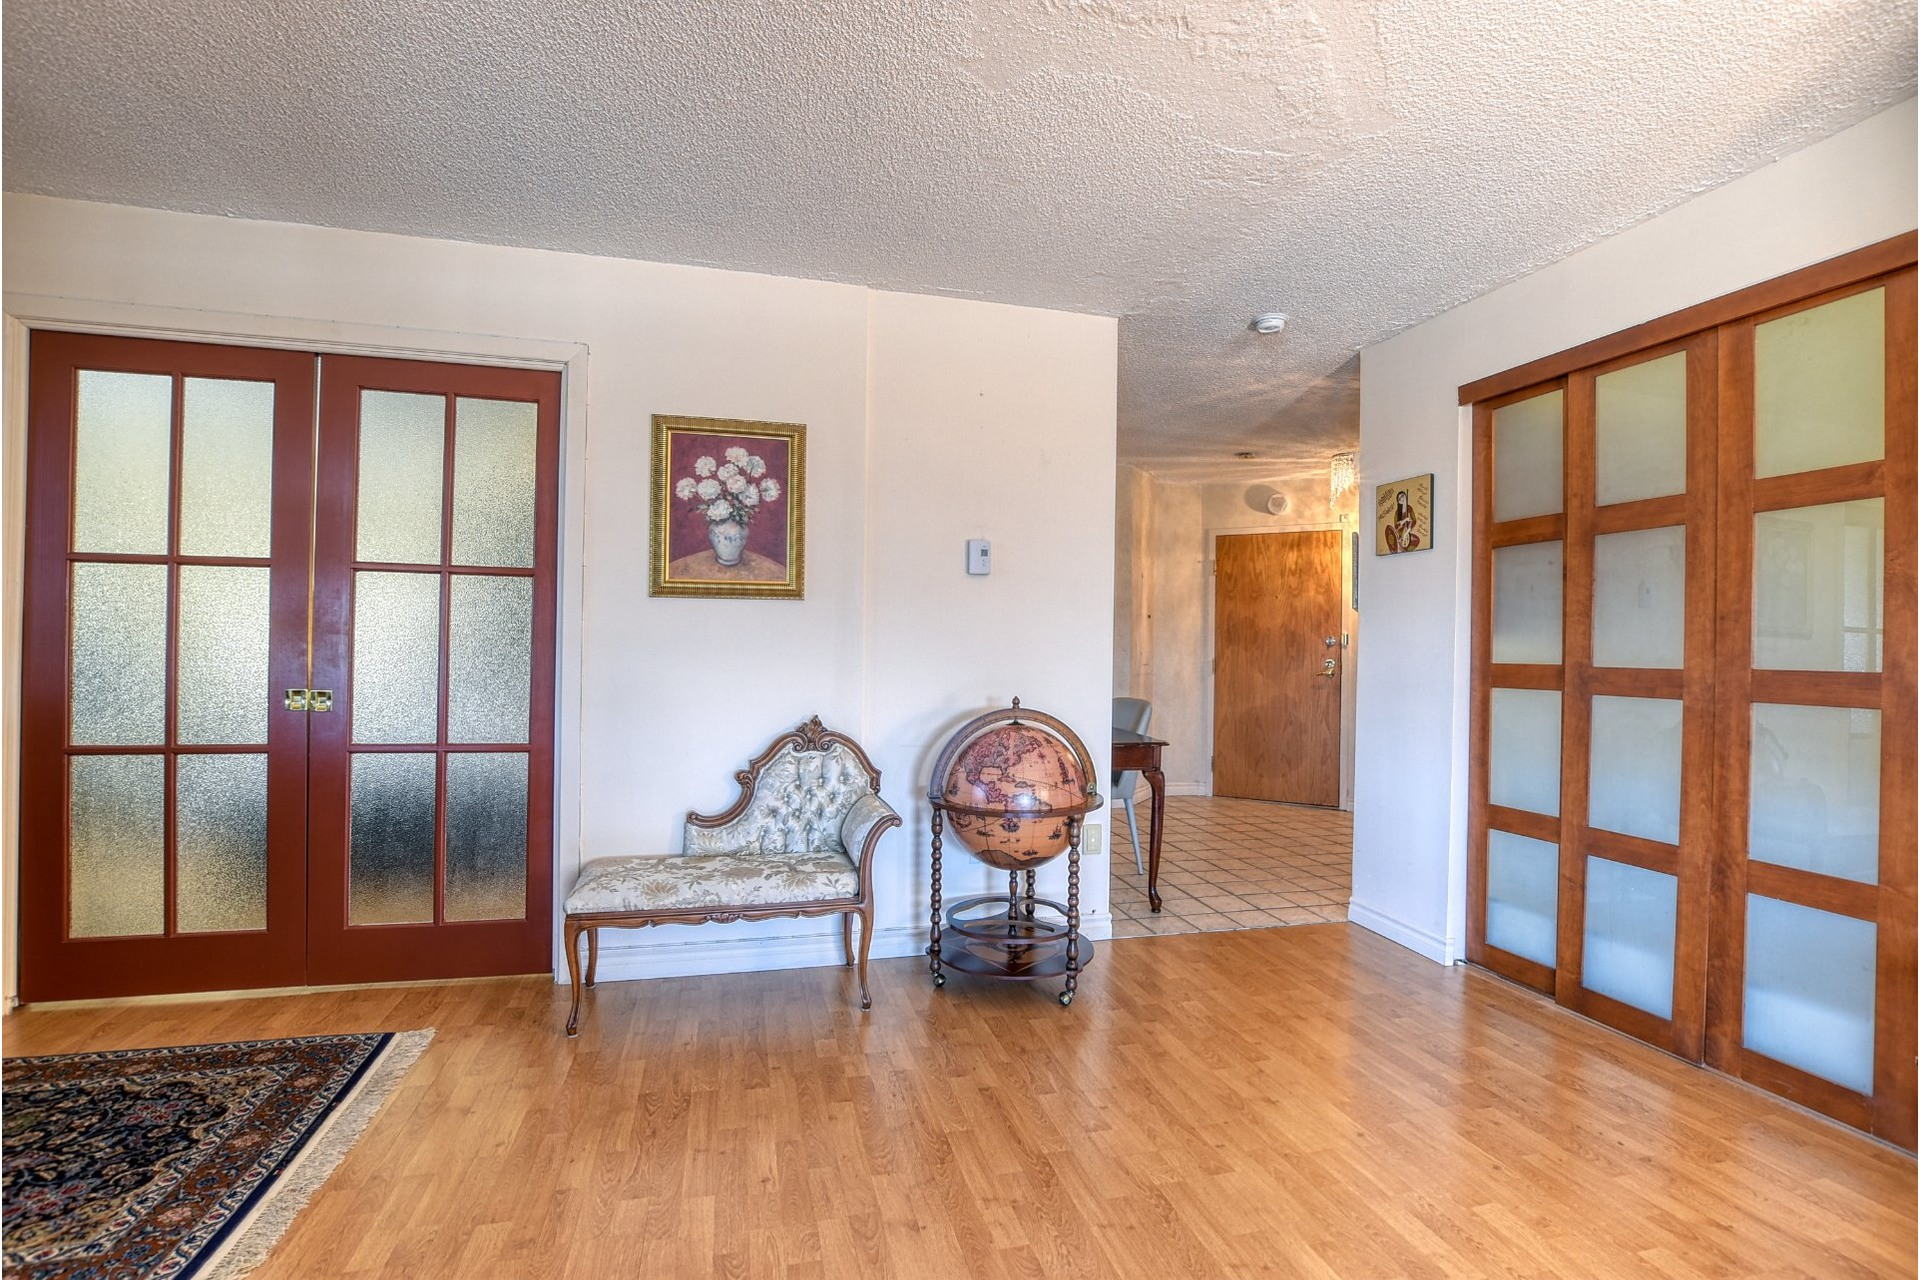 image 4 - Apartment For sale Le Vieux-Longueuil Longueuil  - 6 rooms